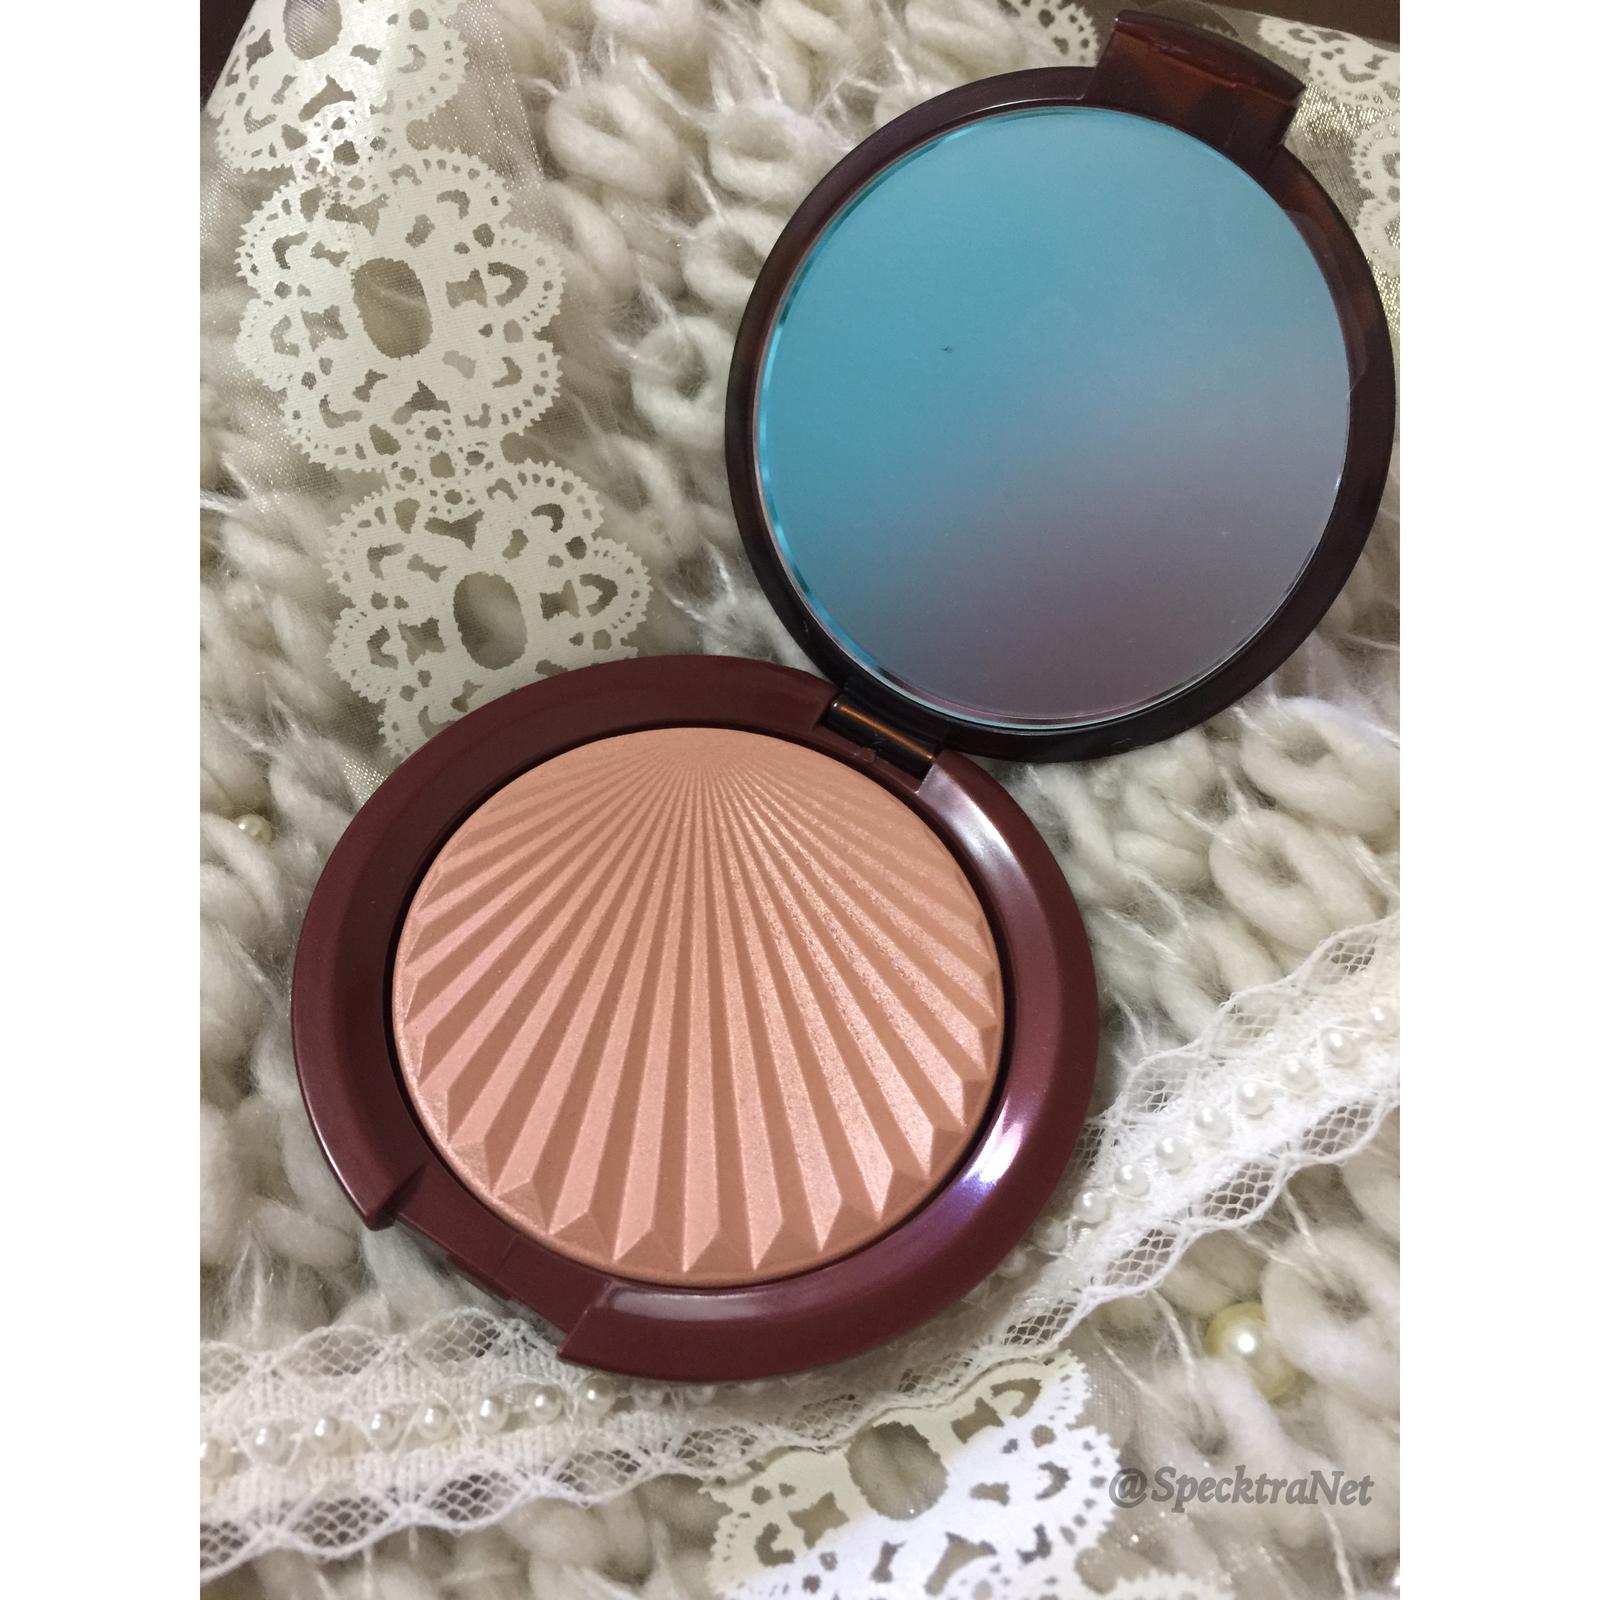 Estee Lauder Bronze Goddess Summer 2015 Collection forecast